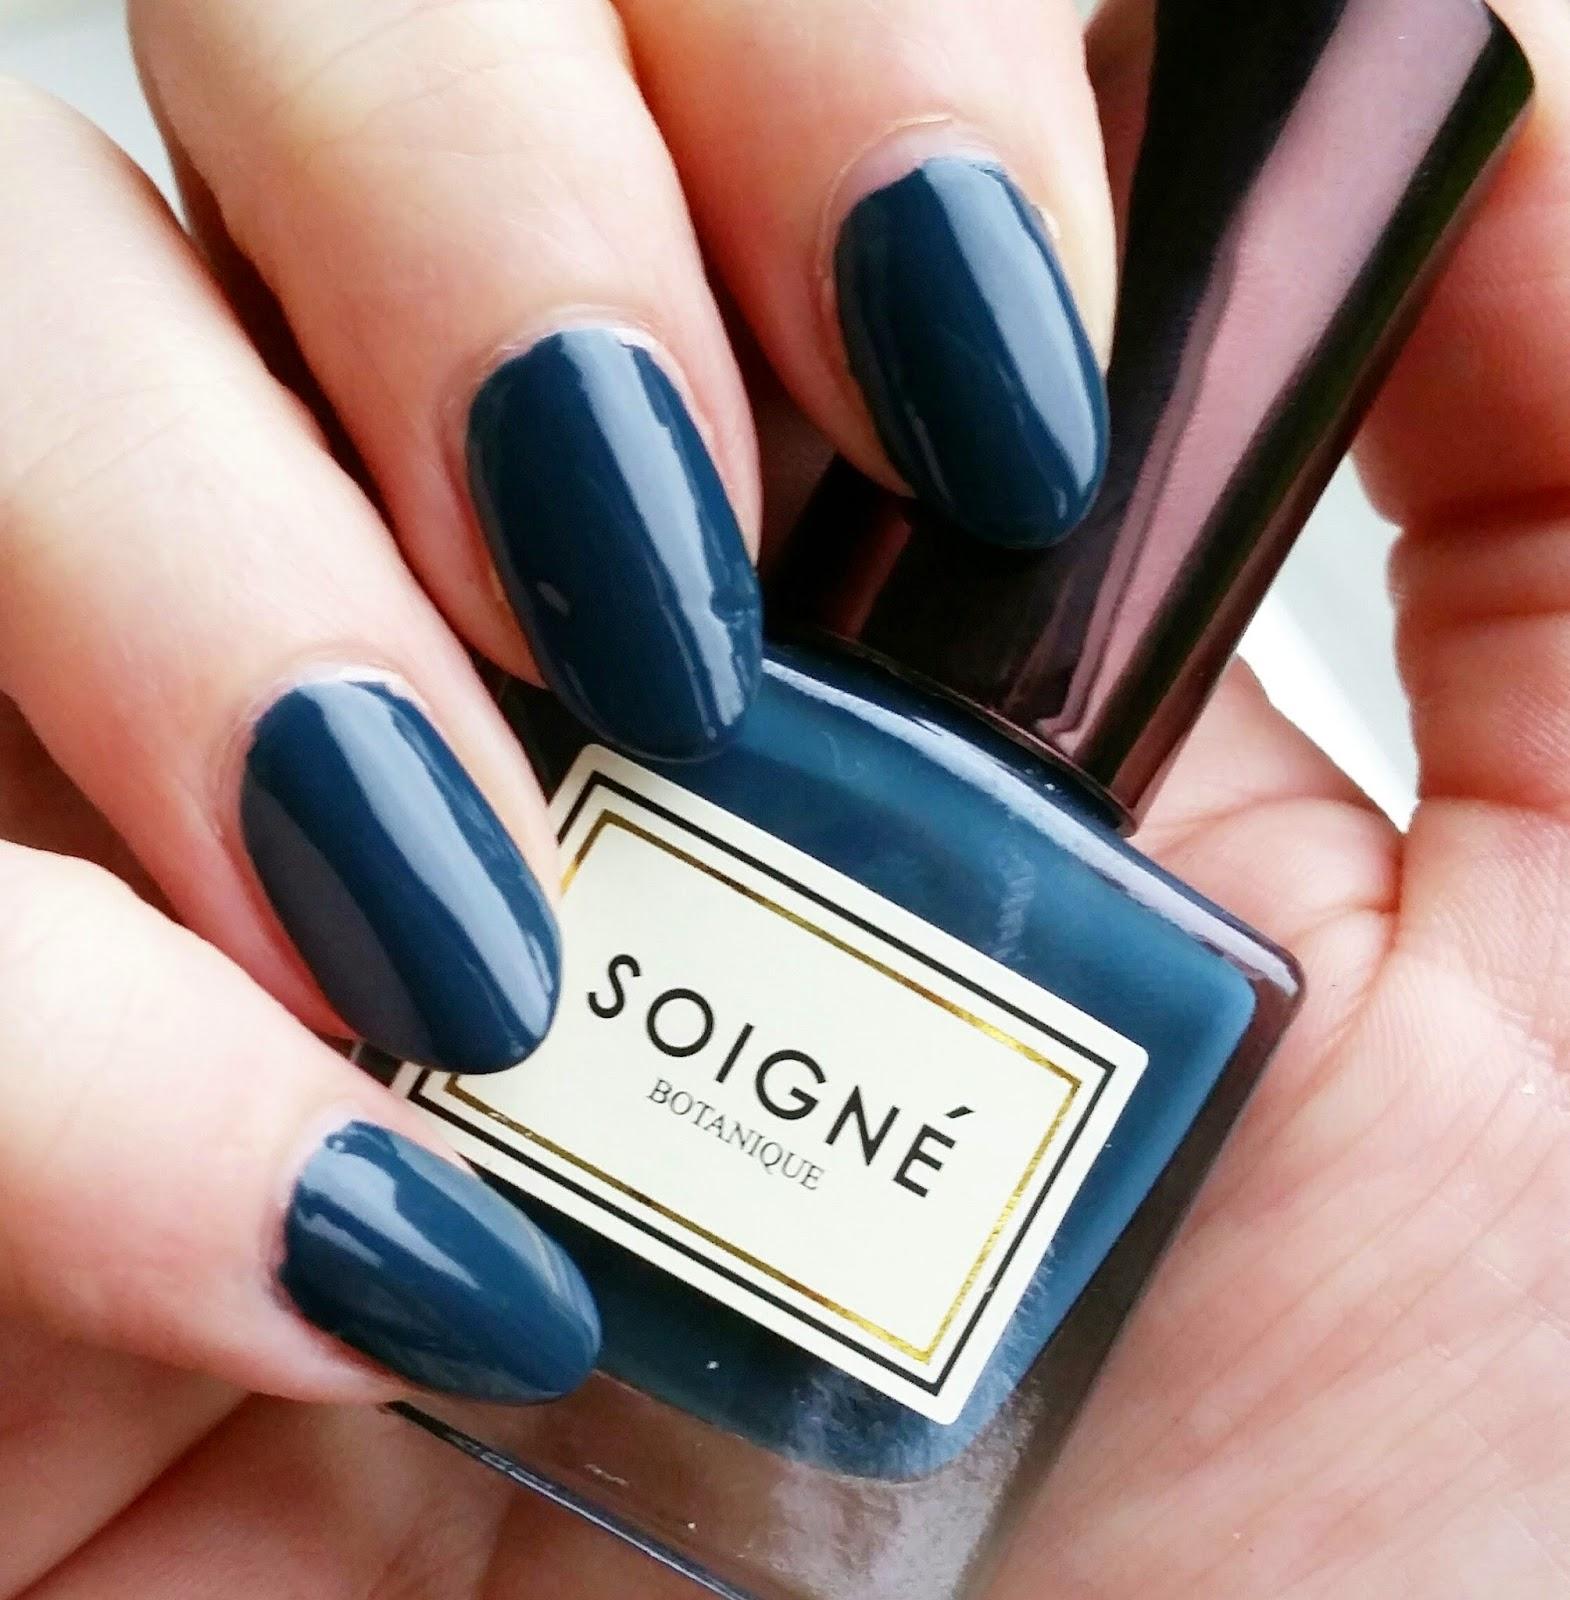 Soigne Plant-Based Nail Polish in Bleuet